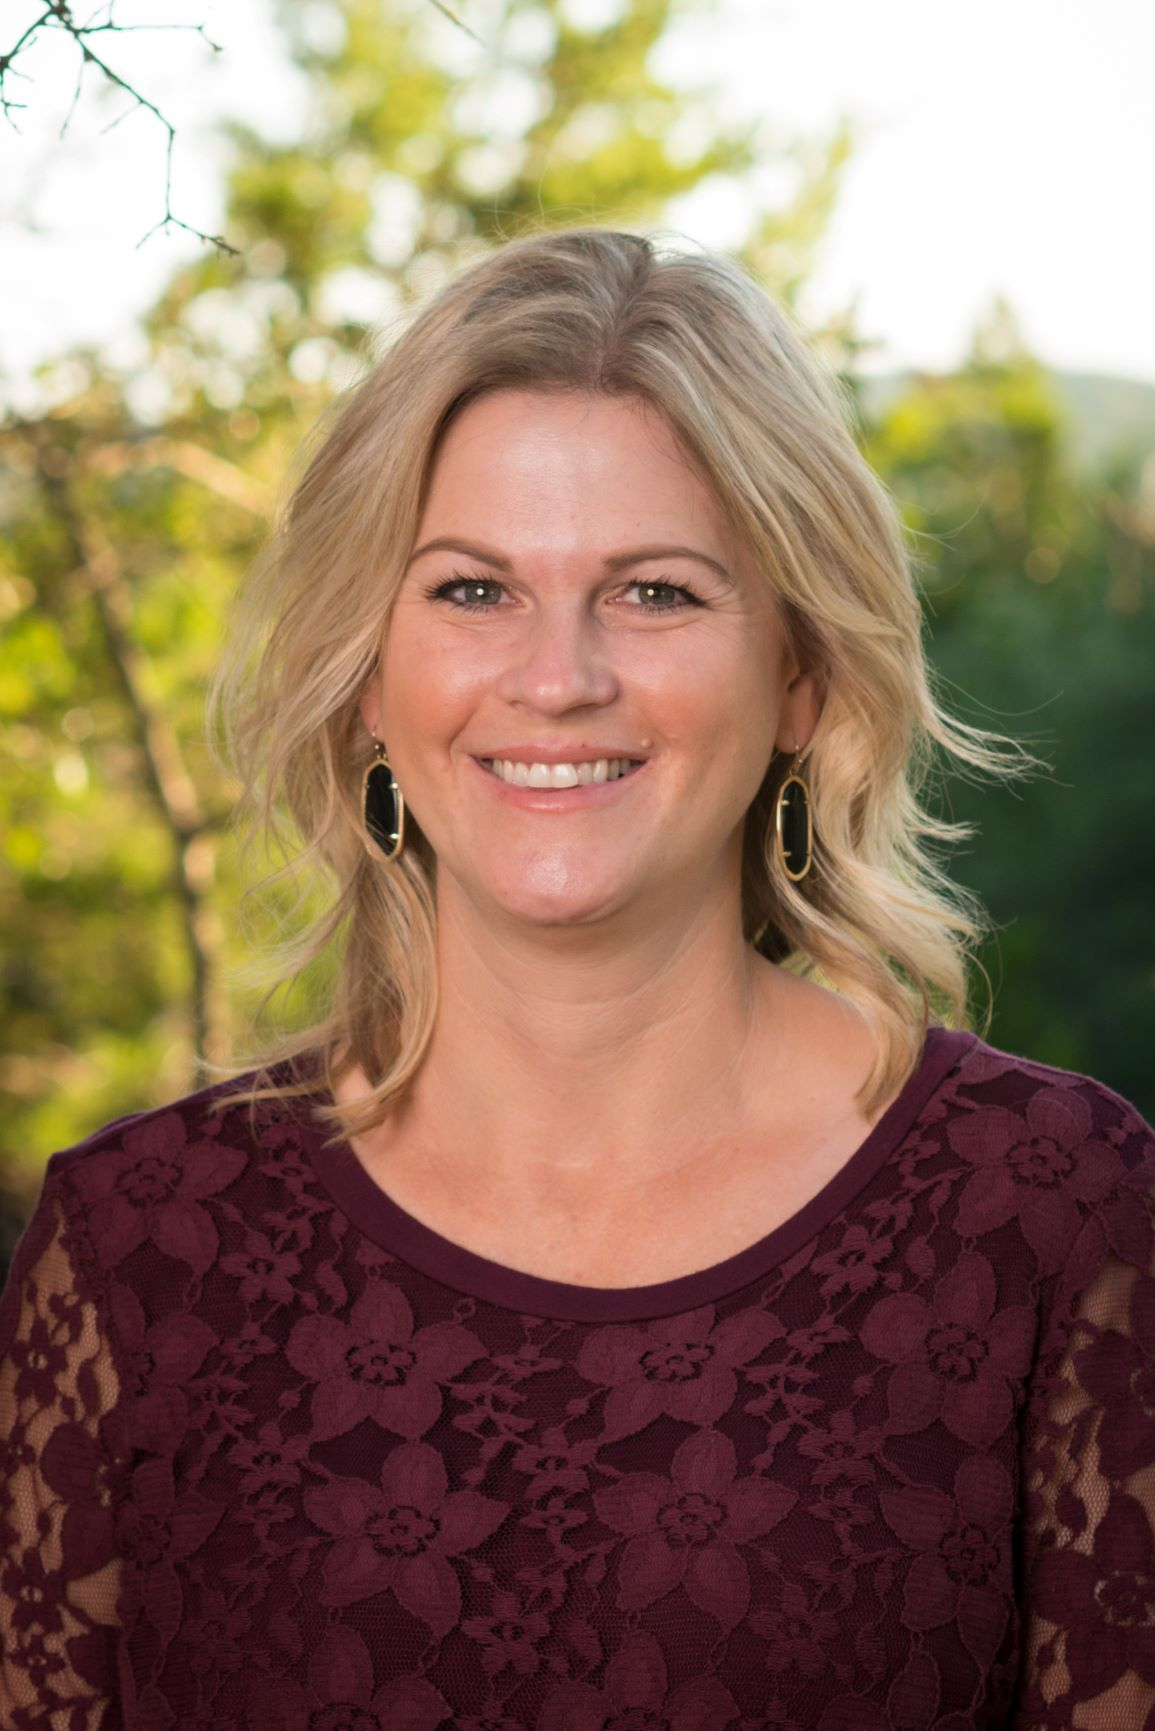 Karlea Shippey